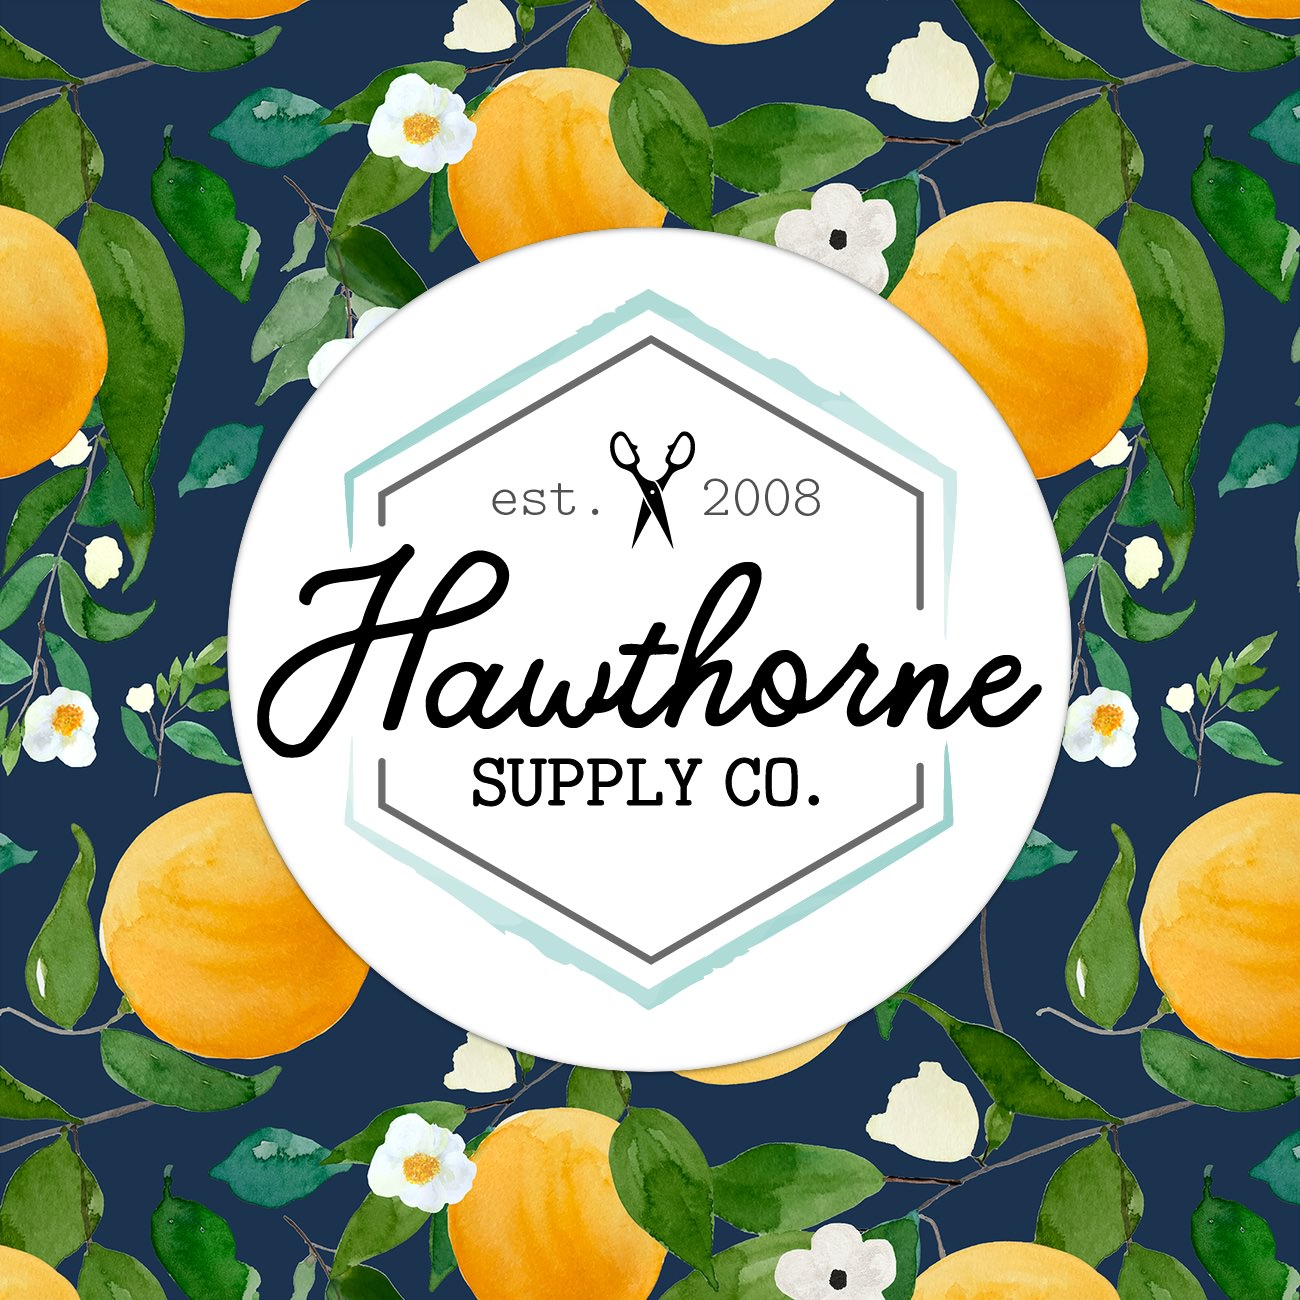 Hawthorne Logo - shopcabin.jpg